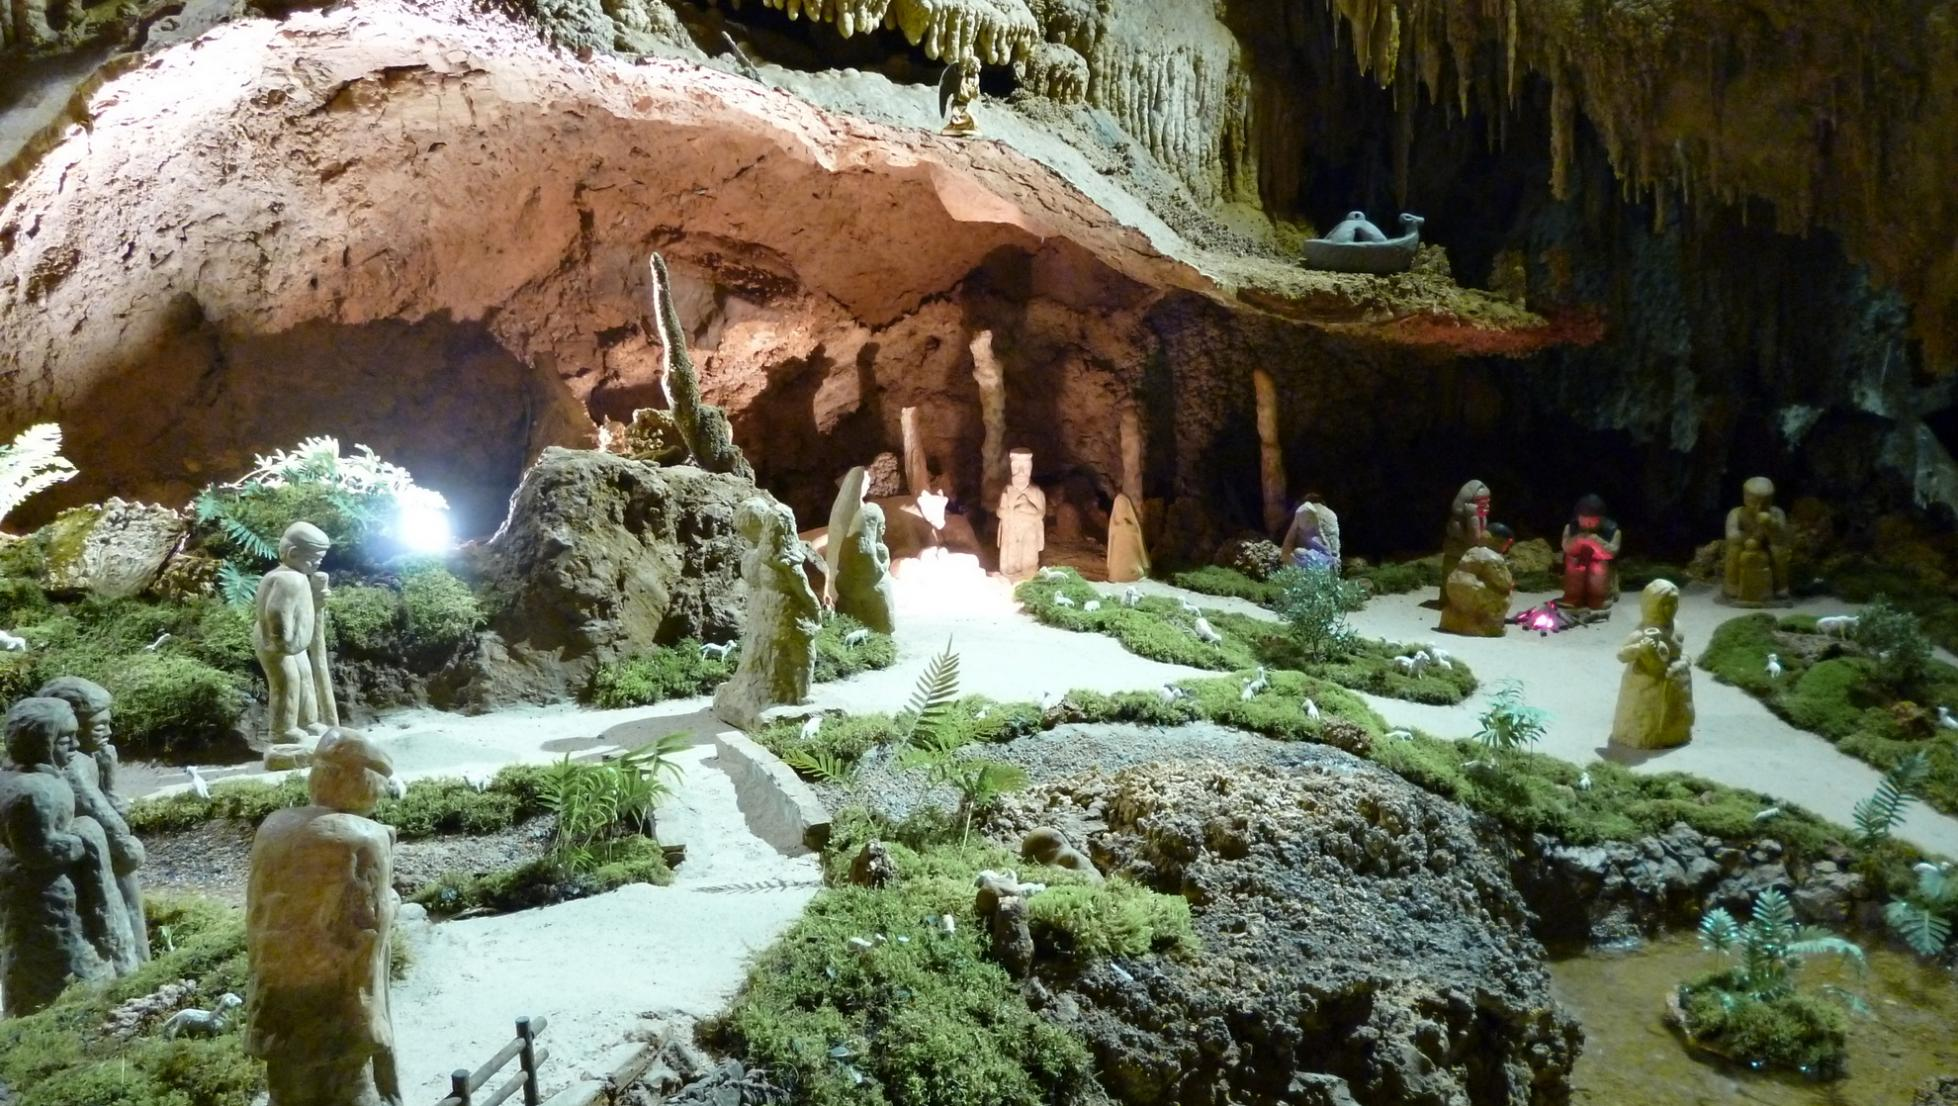 Grotte is Zuddas, presepe